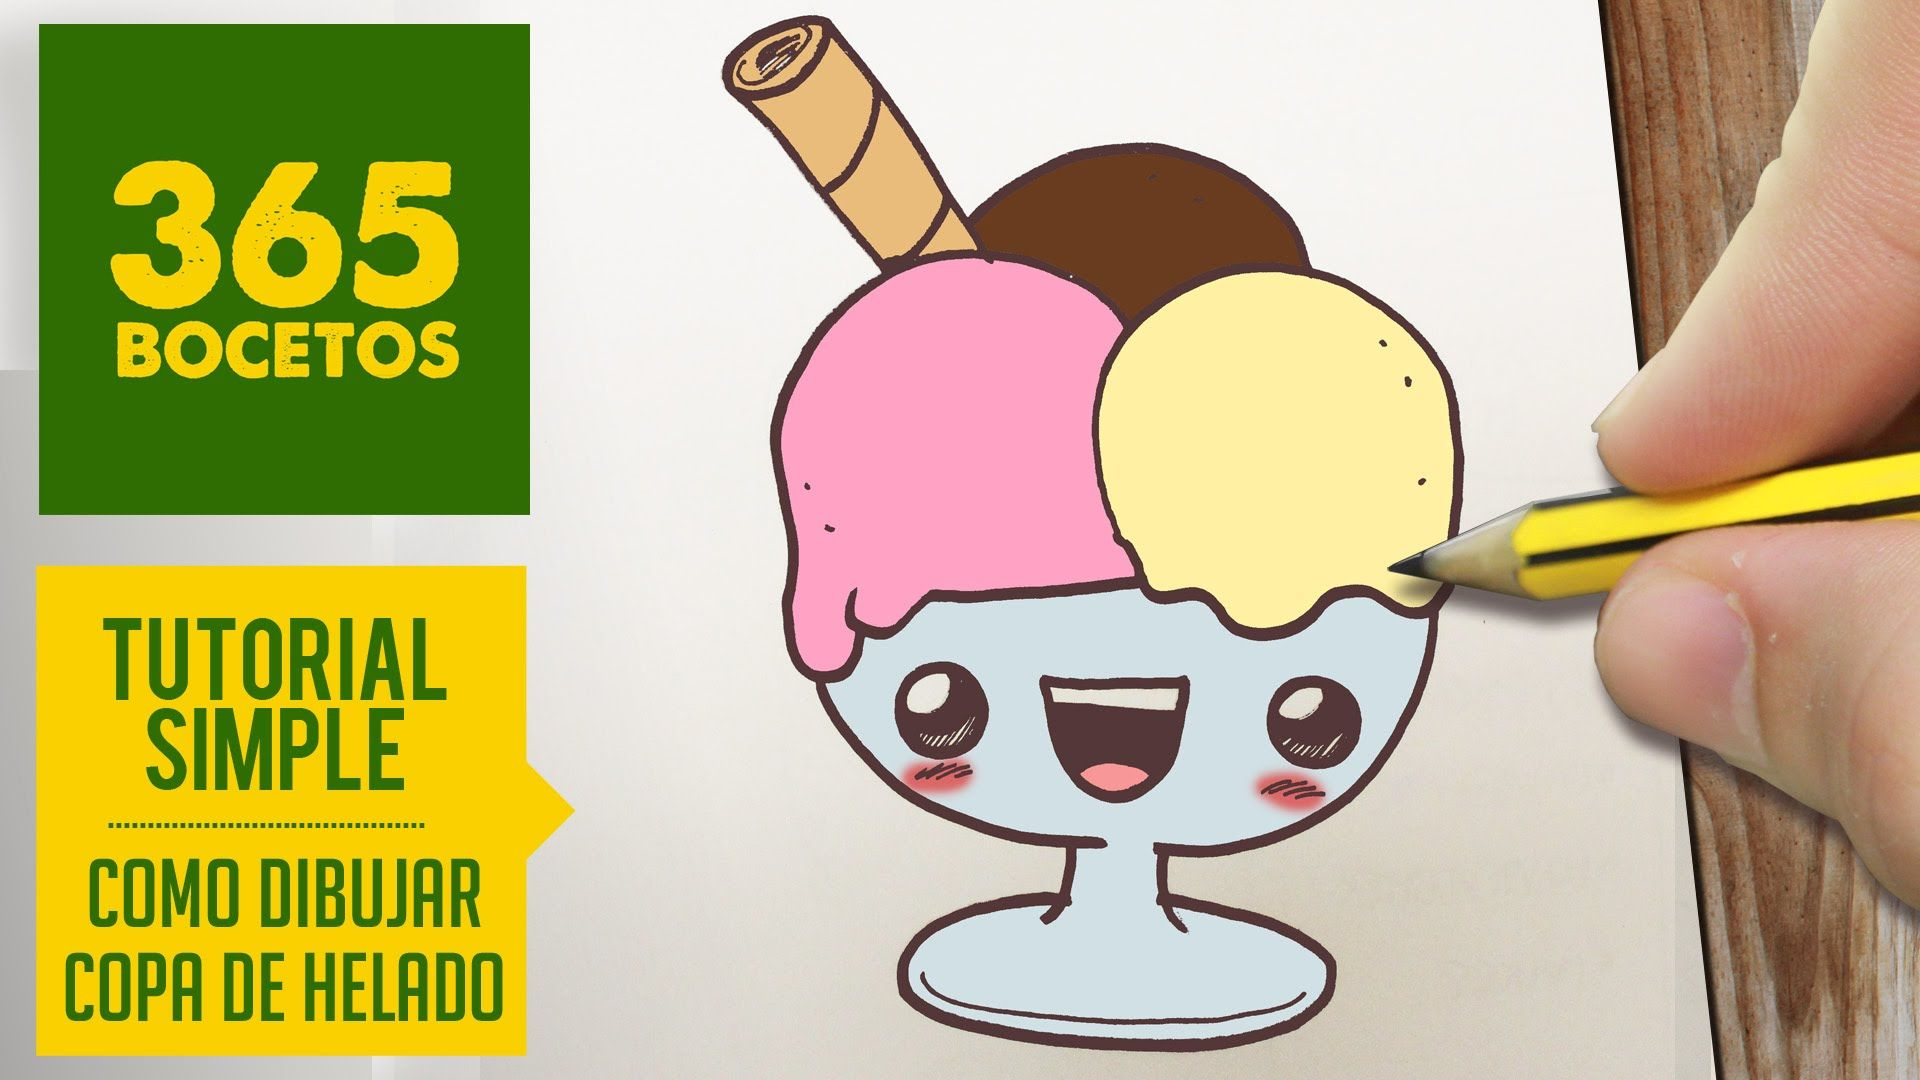 365bocetos Gmail Buscar Con Google Dibujos Kawaii Dibujos